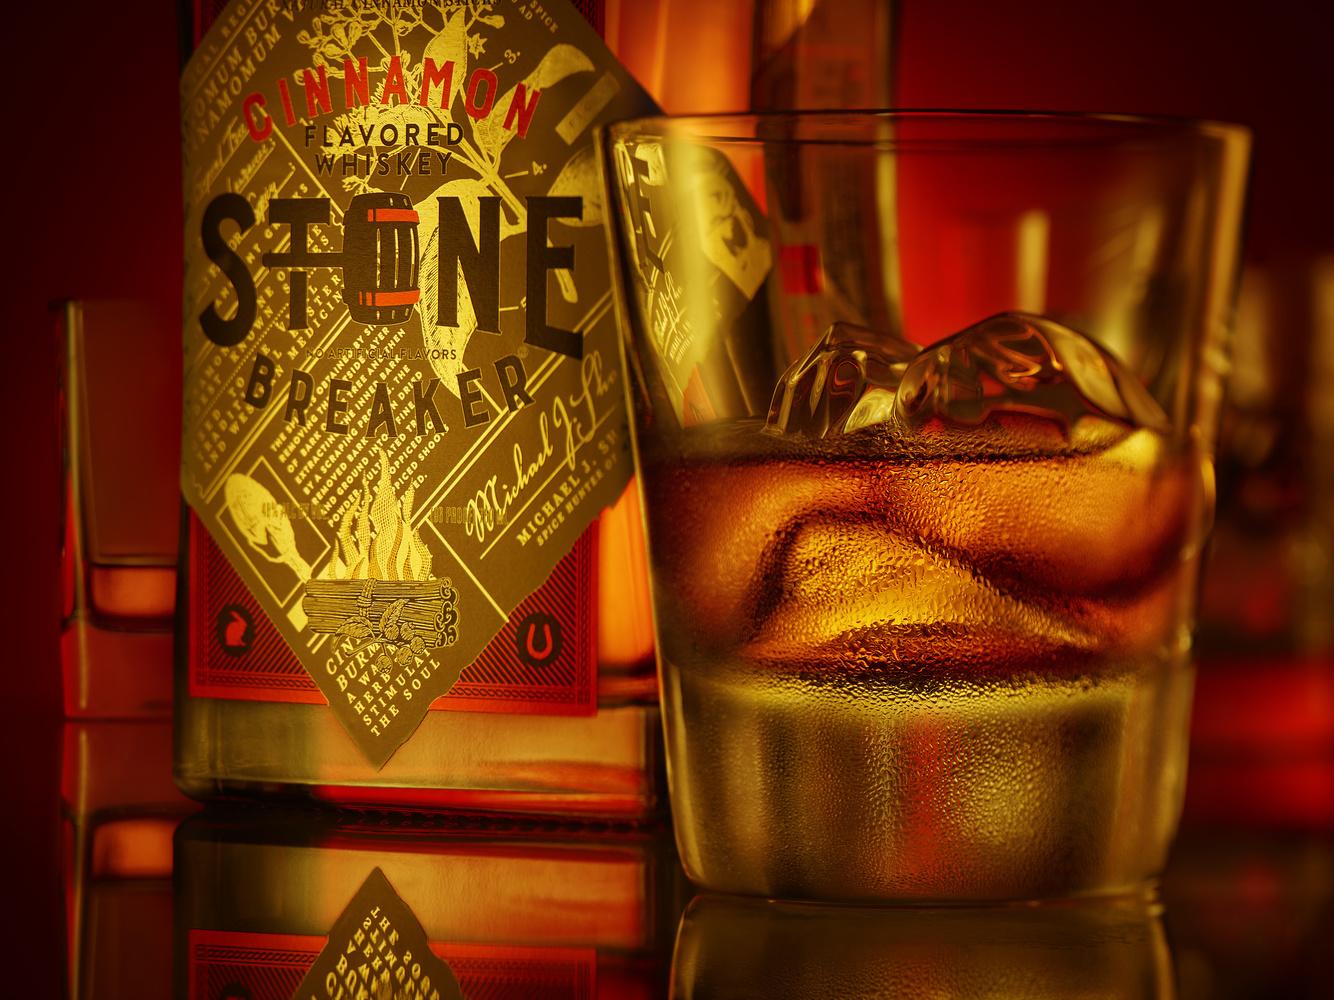 Restless Spirits//Stone Breaker Cinnamon by Ryan Hill